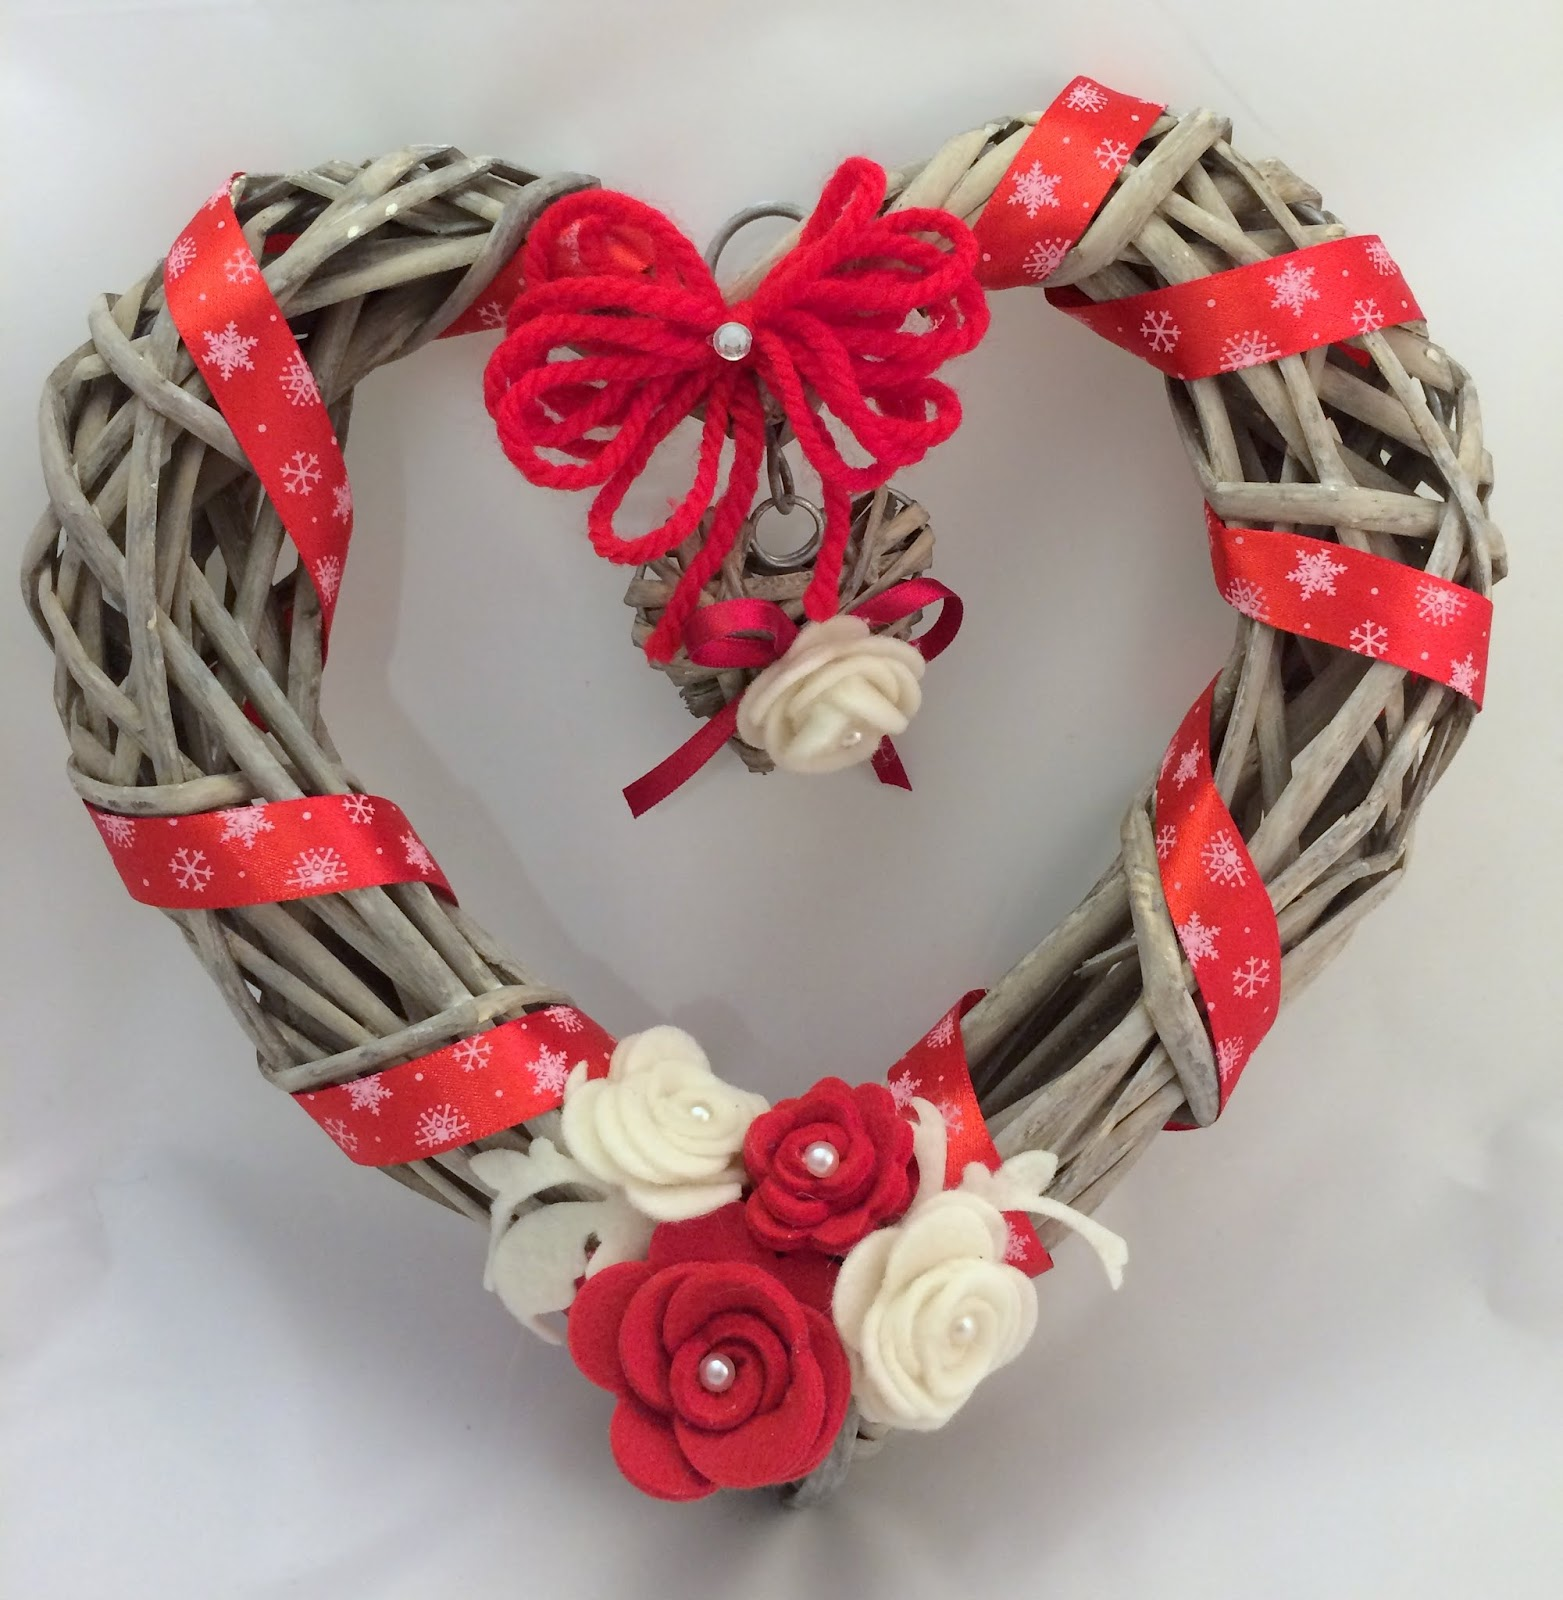 abbastanza Lumaca Matta - Handmade with love: .ancora ghirlande natalizie CW95